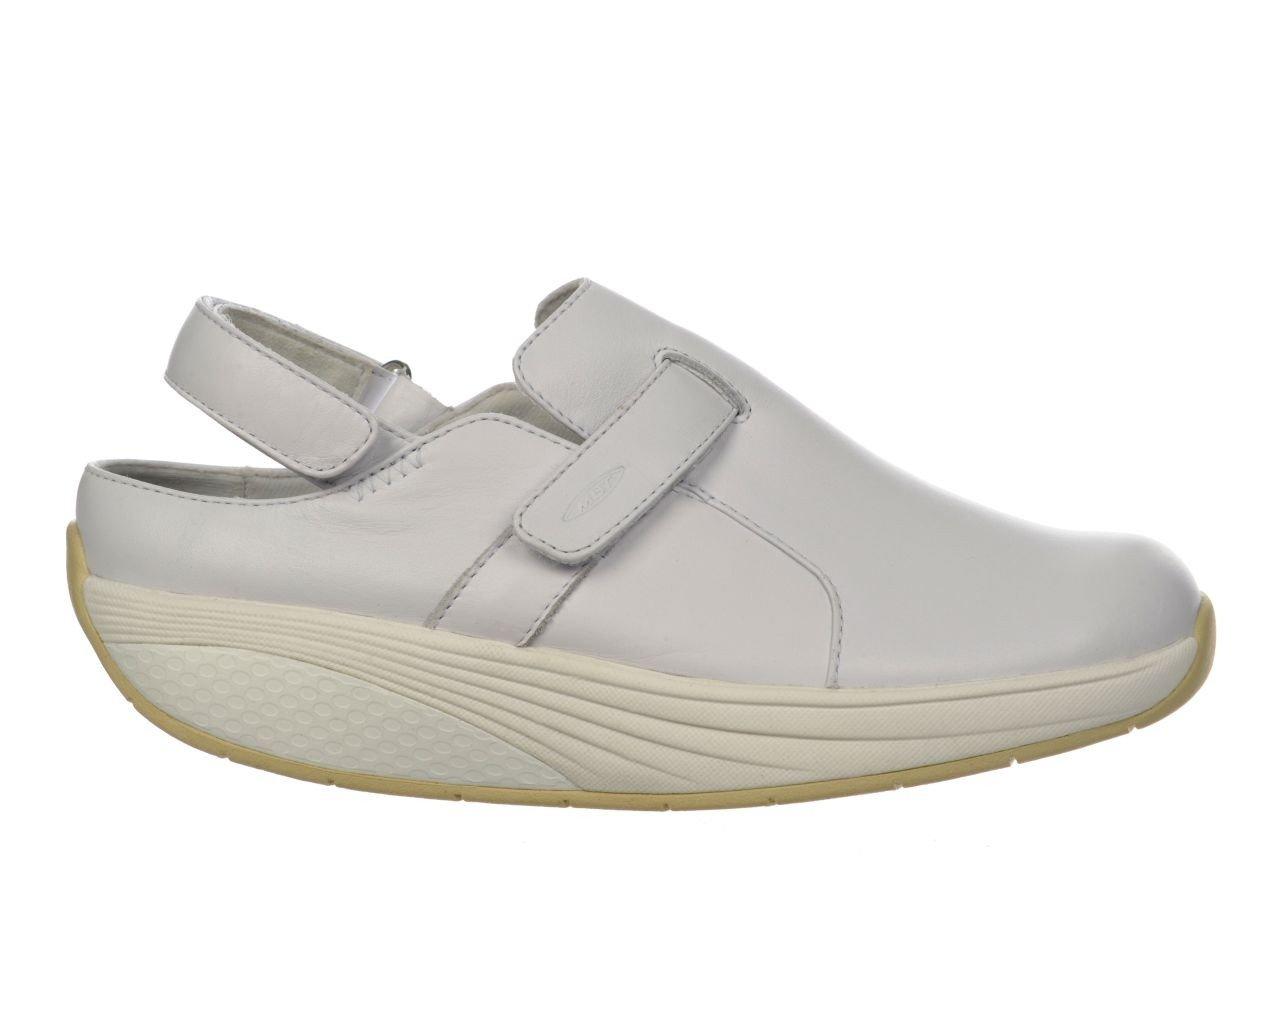 MBT Women's Flua Work Walking Shoe EU 38 / US 7-7.5 White